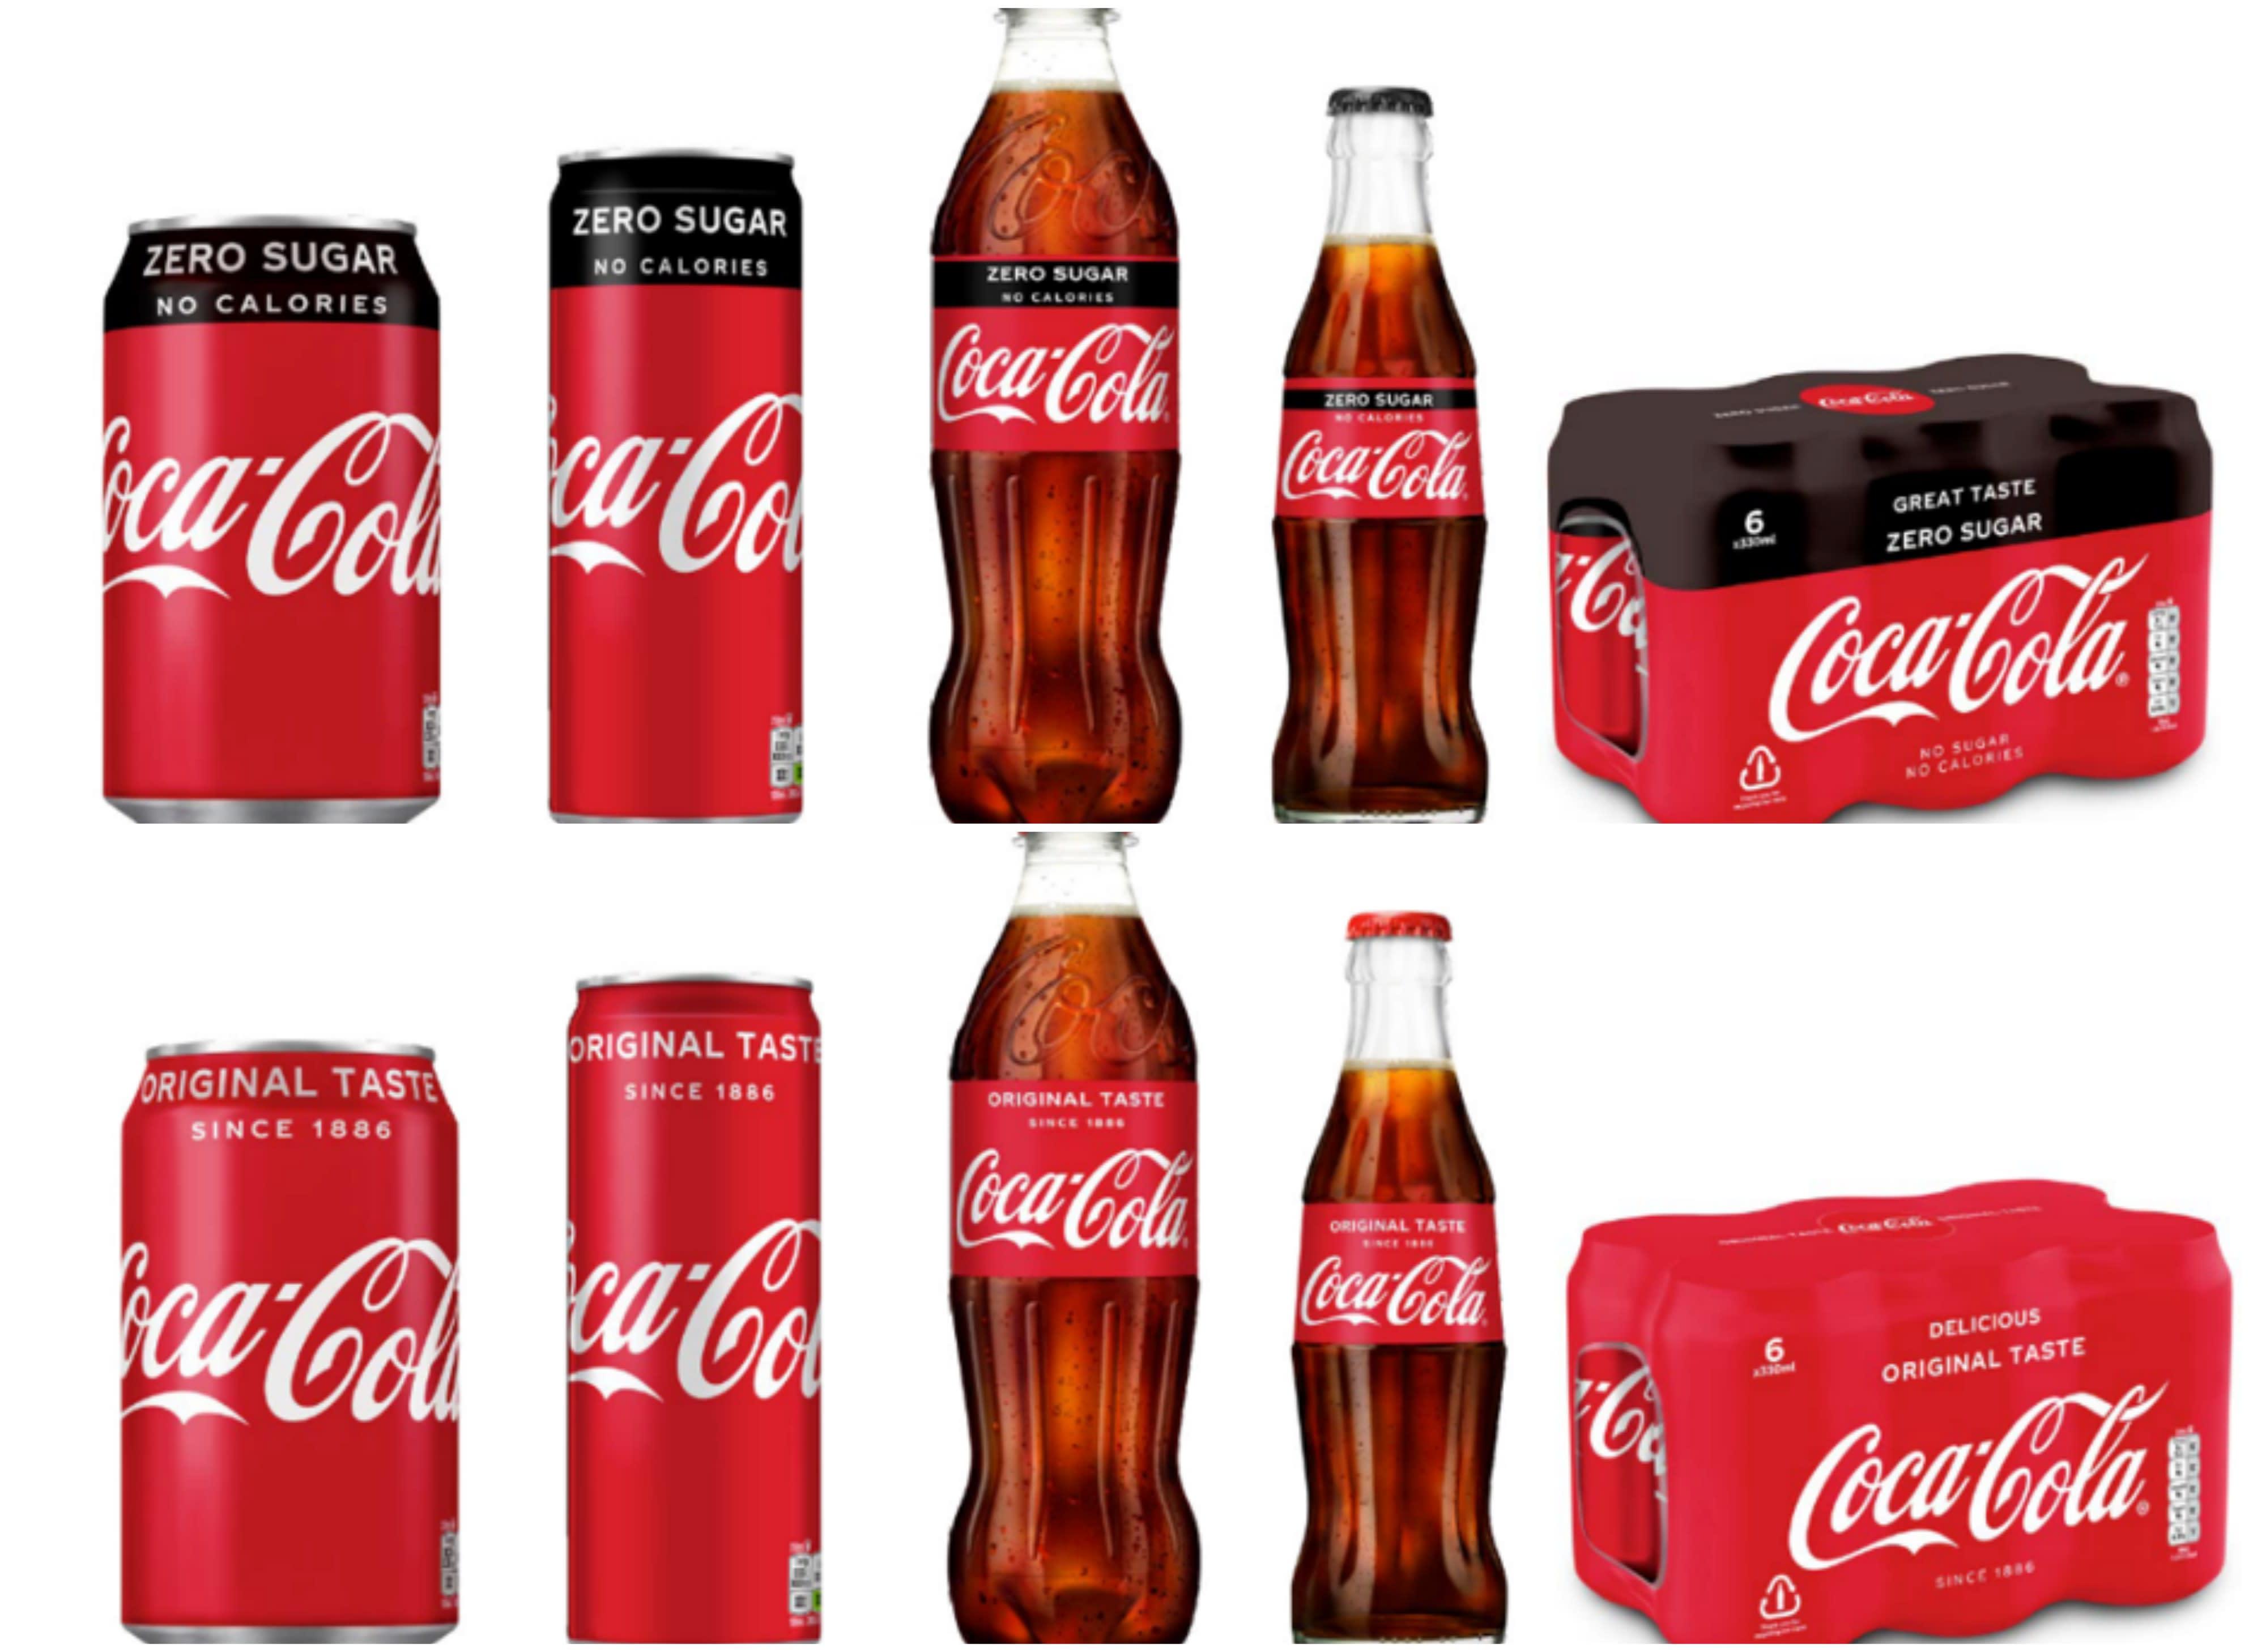 coca cola uk redesigns zero packaging to look like the original coke